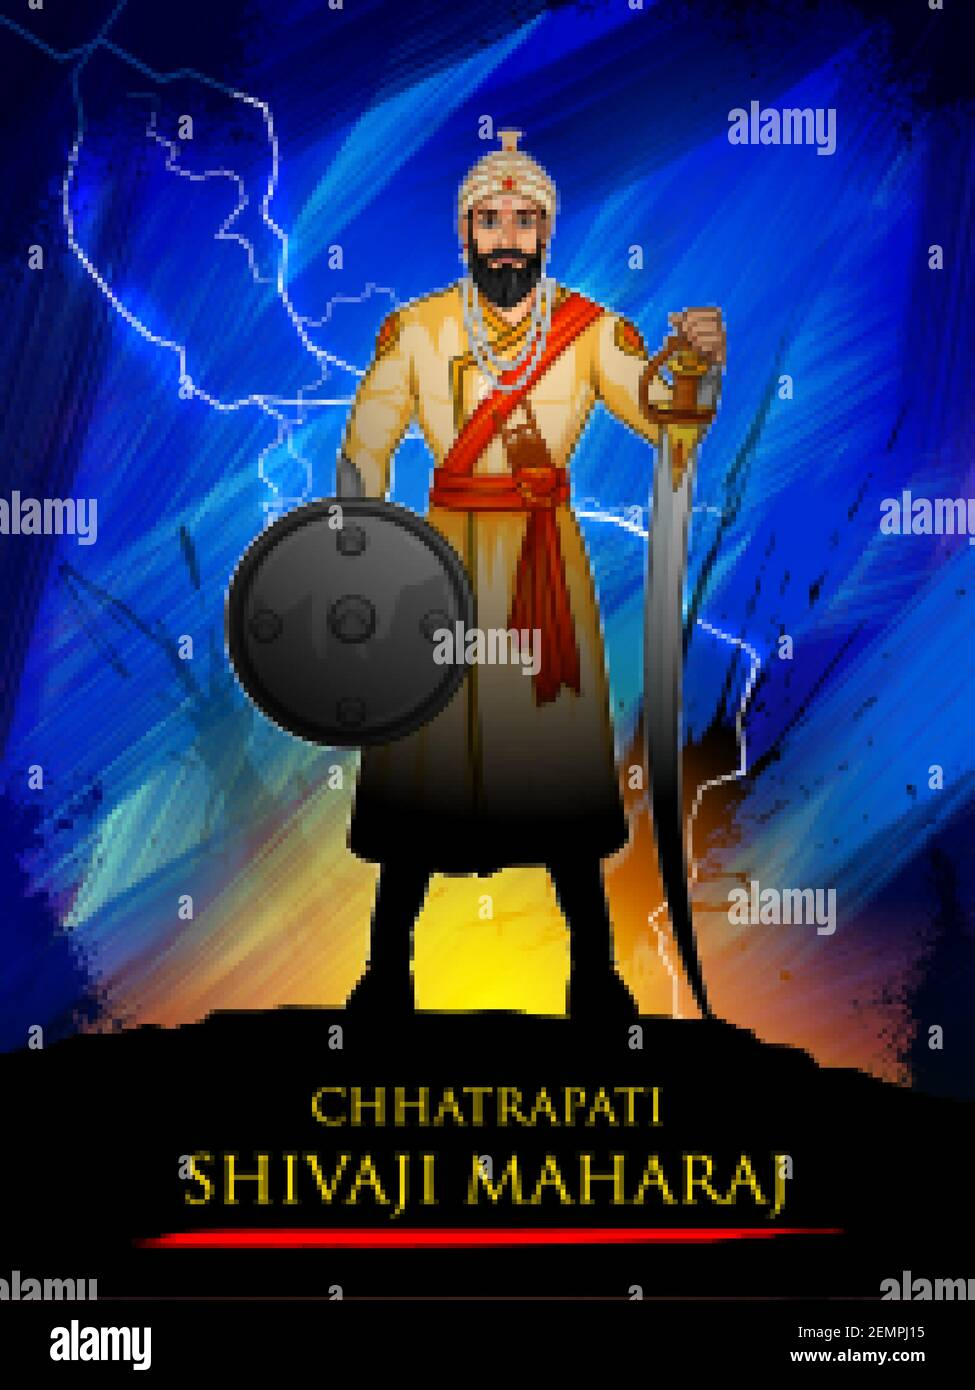 Illustration von Chhatrapati Shivaji Maharaj, dem großen Krieger ...